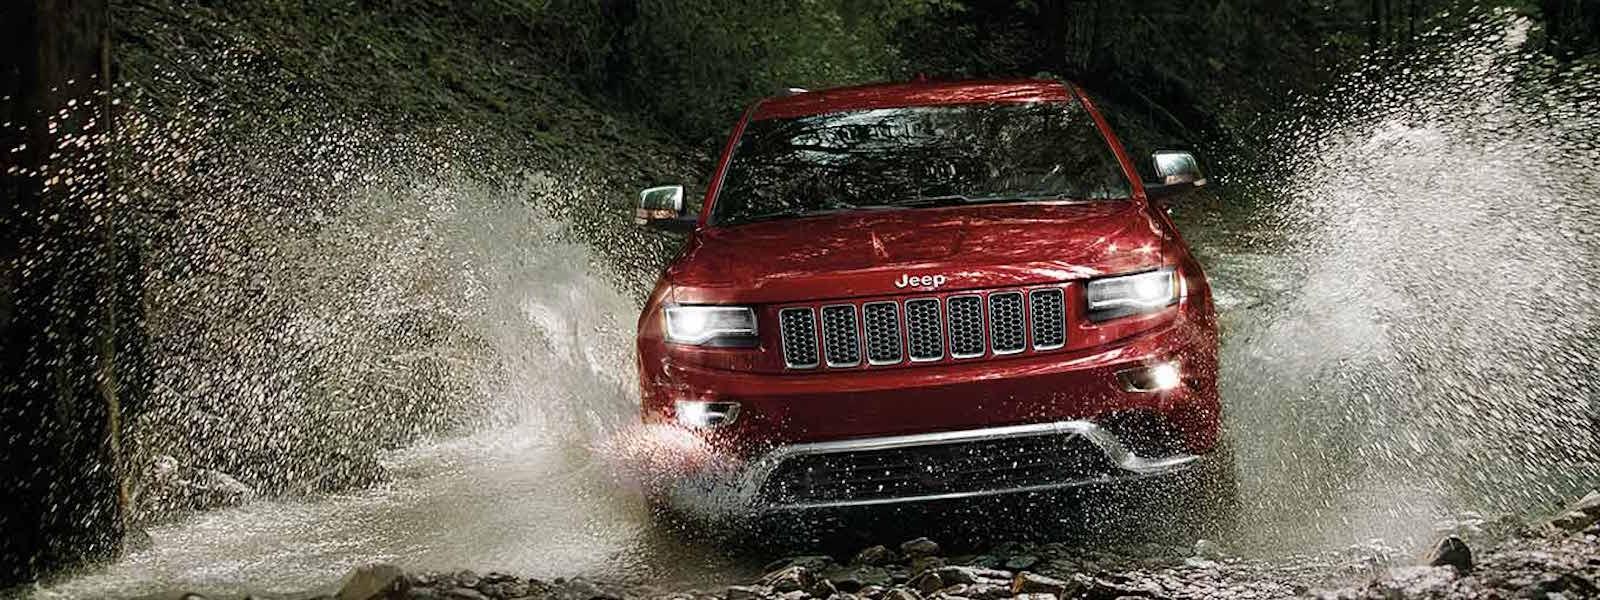 2016 Jeep Grand Cherokee splash performance – Colorado Springs, CO